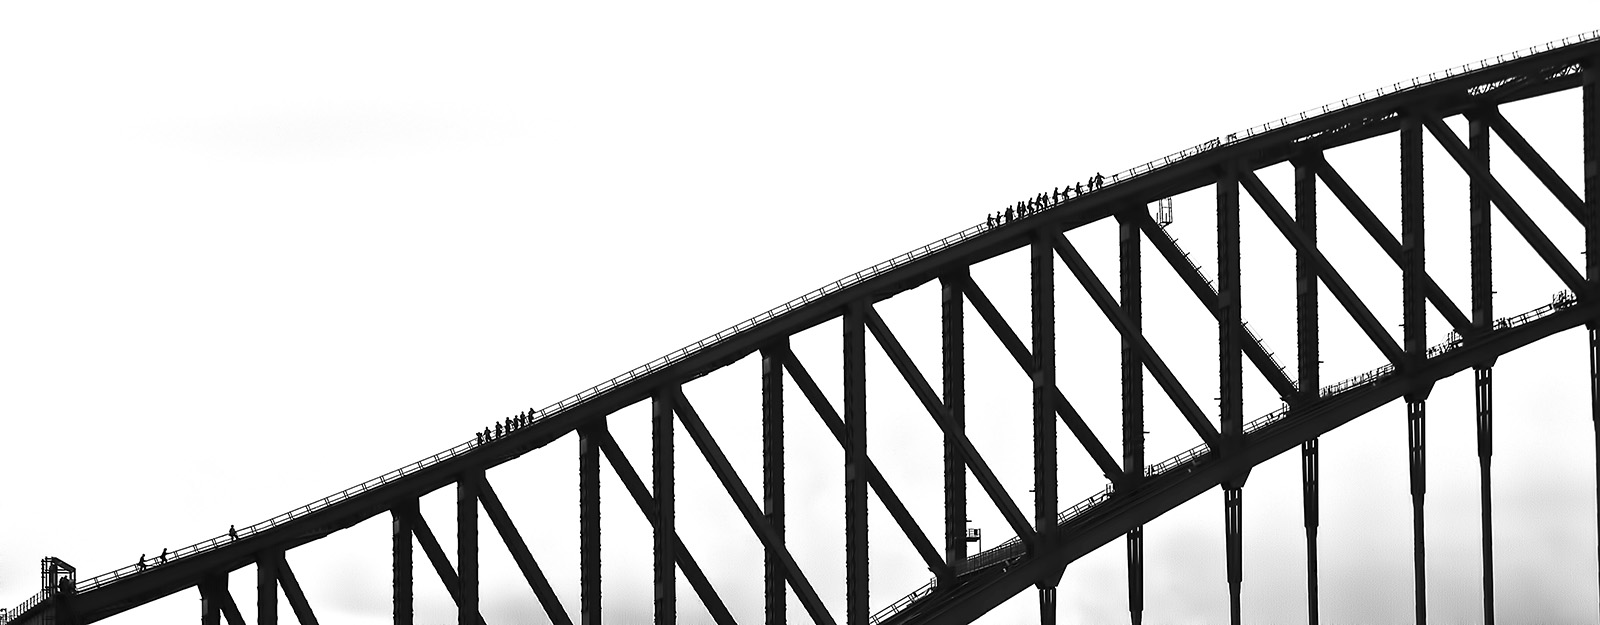 Sydney Harbor Bridge Overexposed.jpg